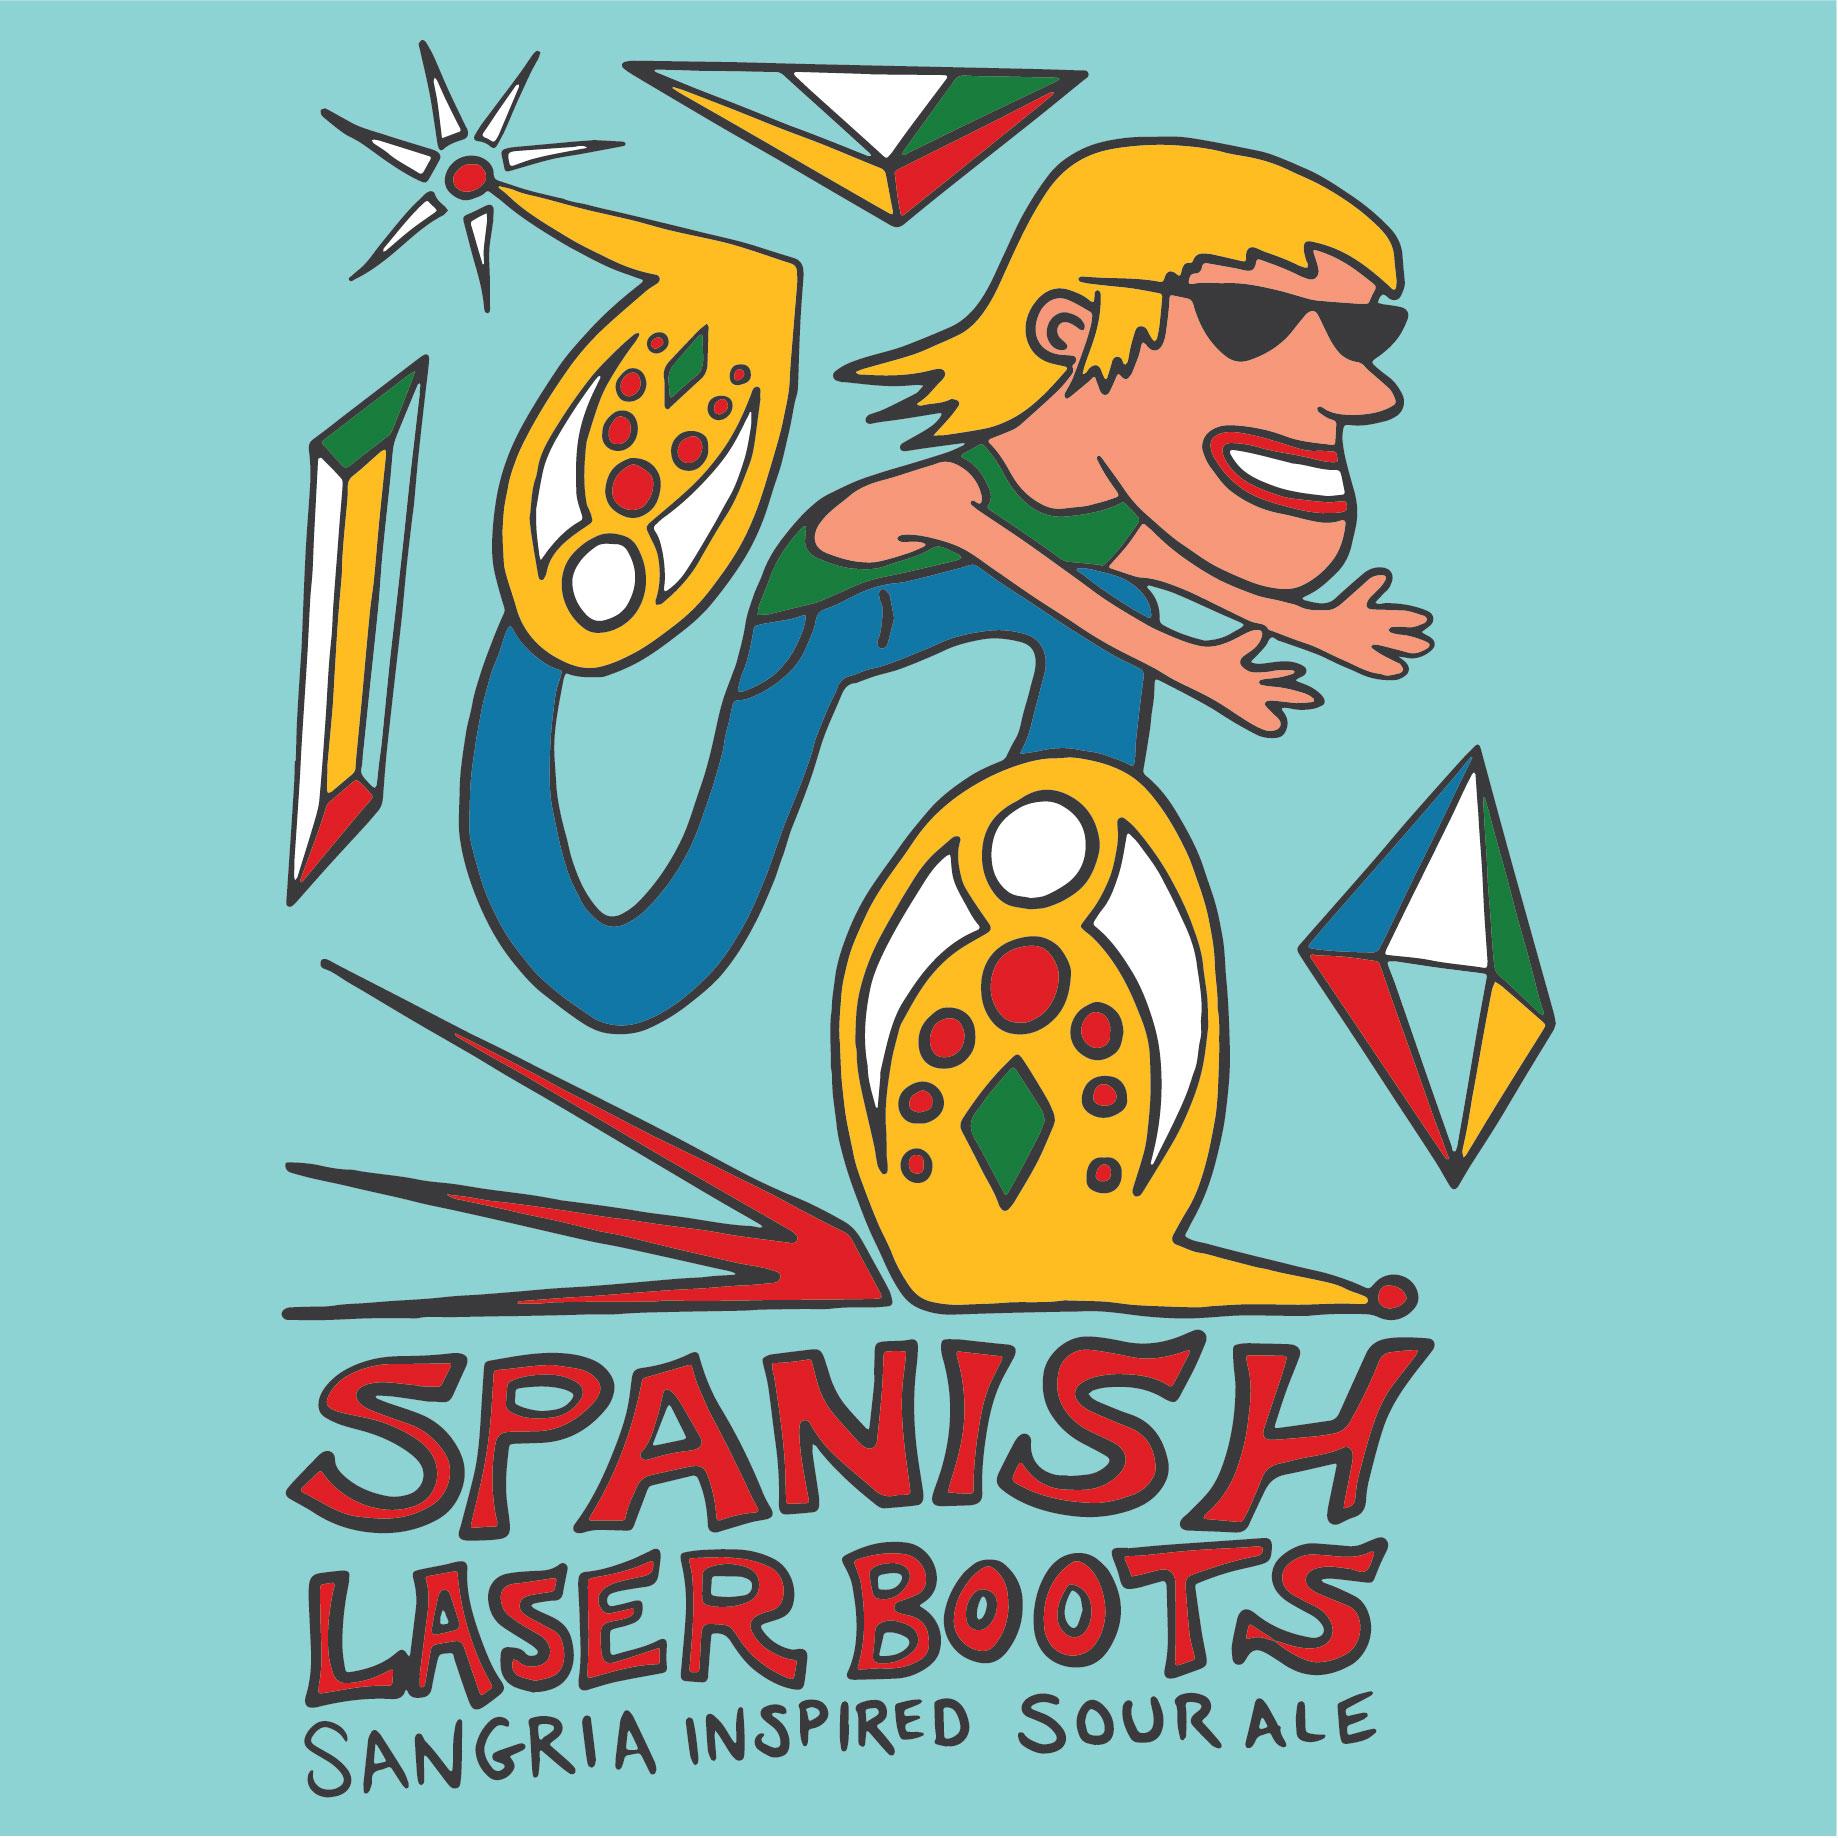 Spanish Laser Boots Logo-01.jpg